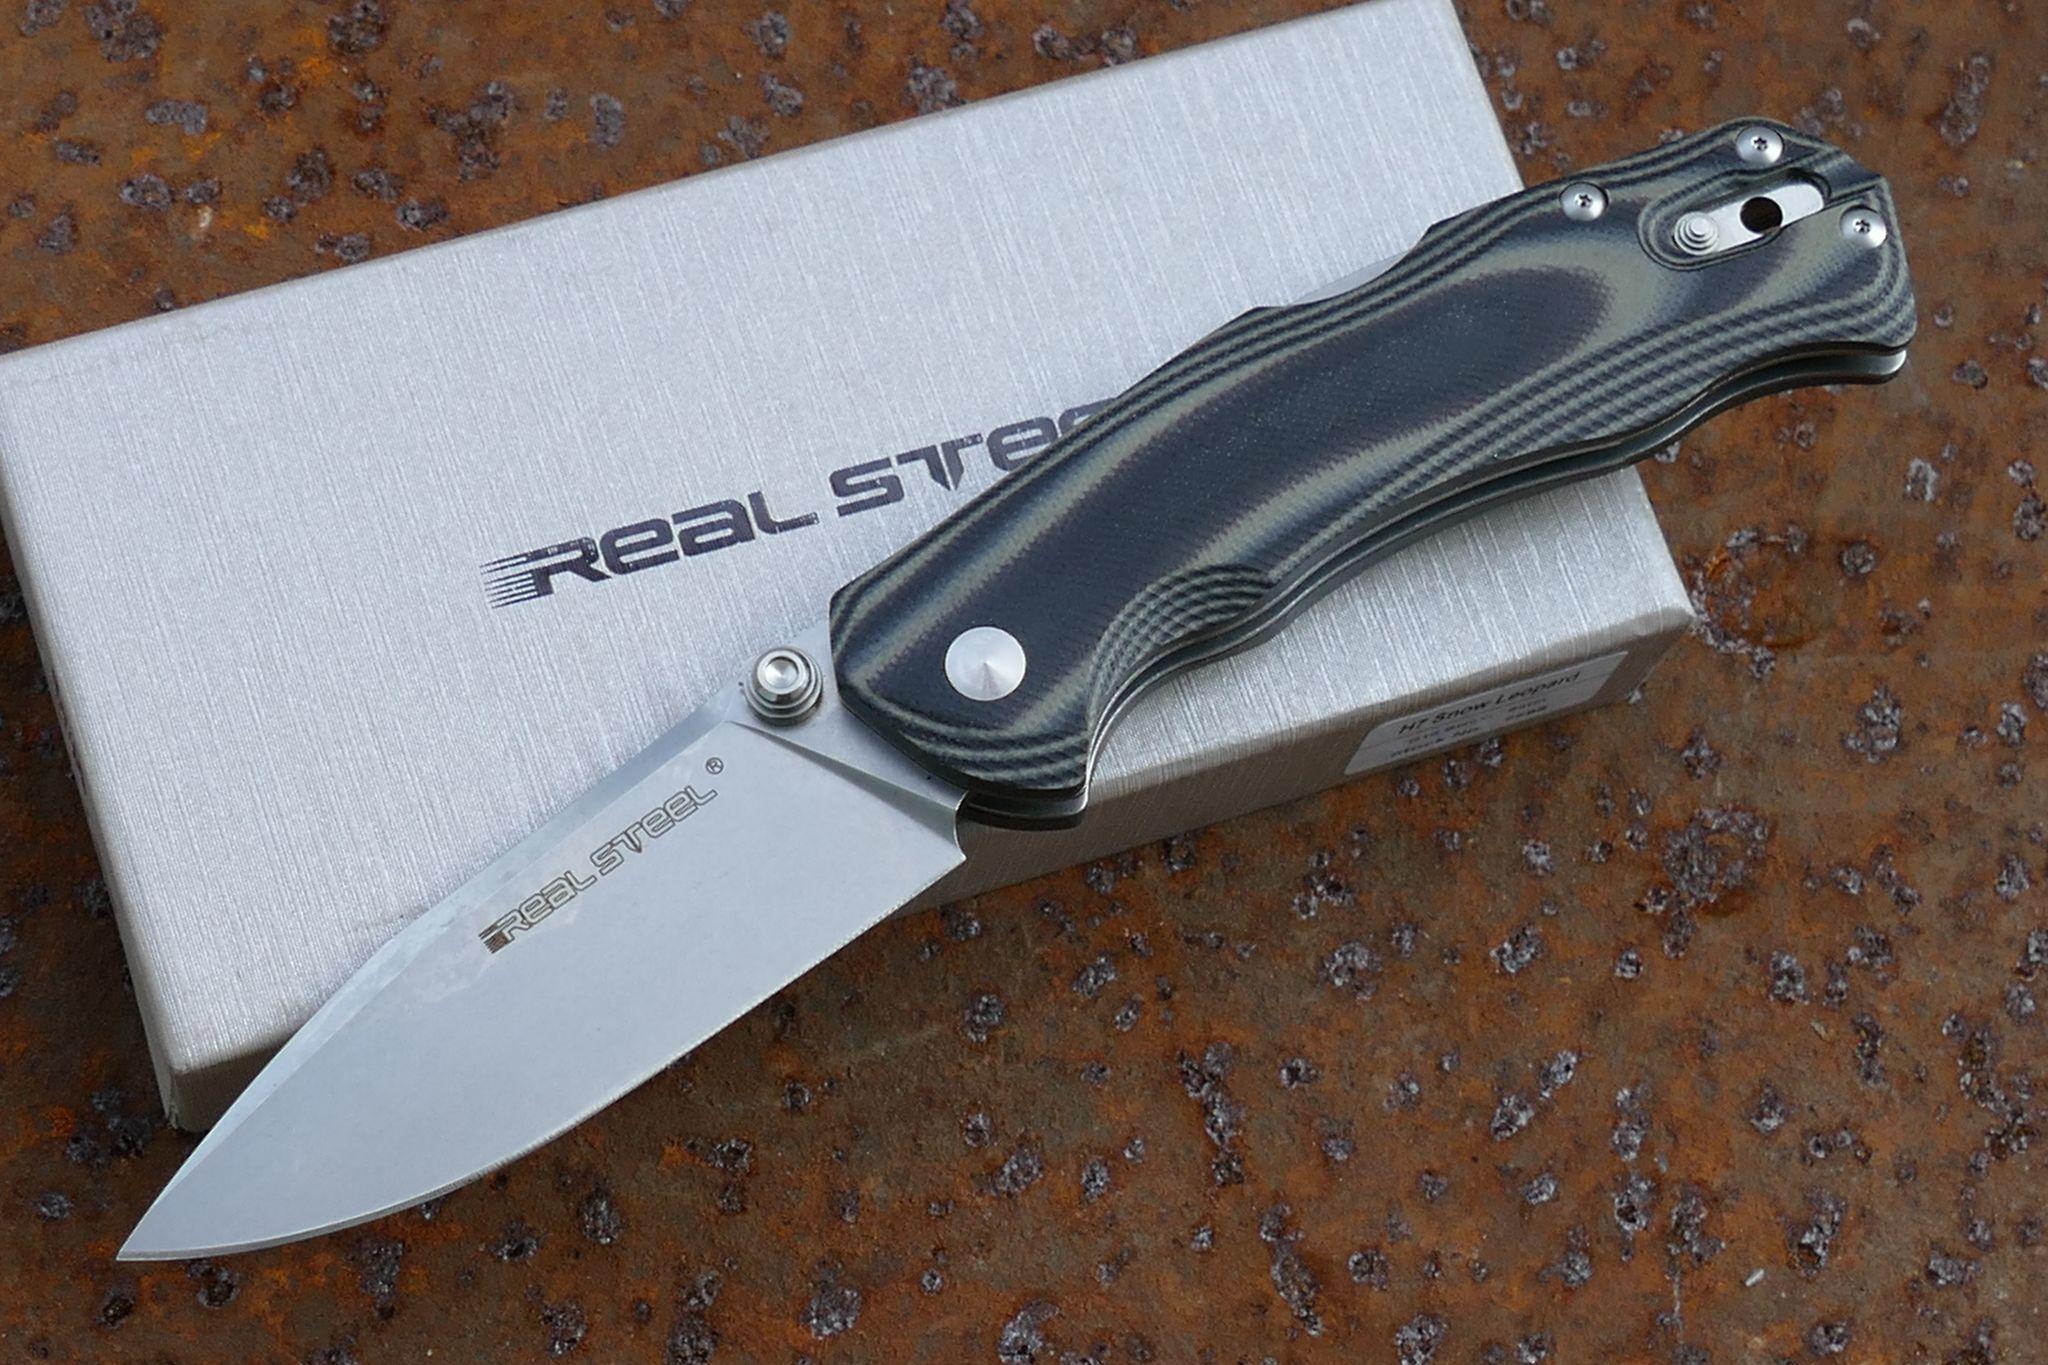 Фото 7 - Нож складной H7 Snow Leopard, Black/Gray G10 от Realsteel